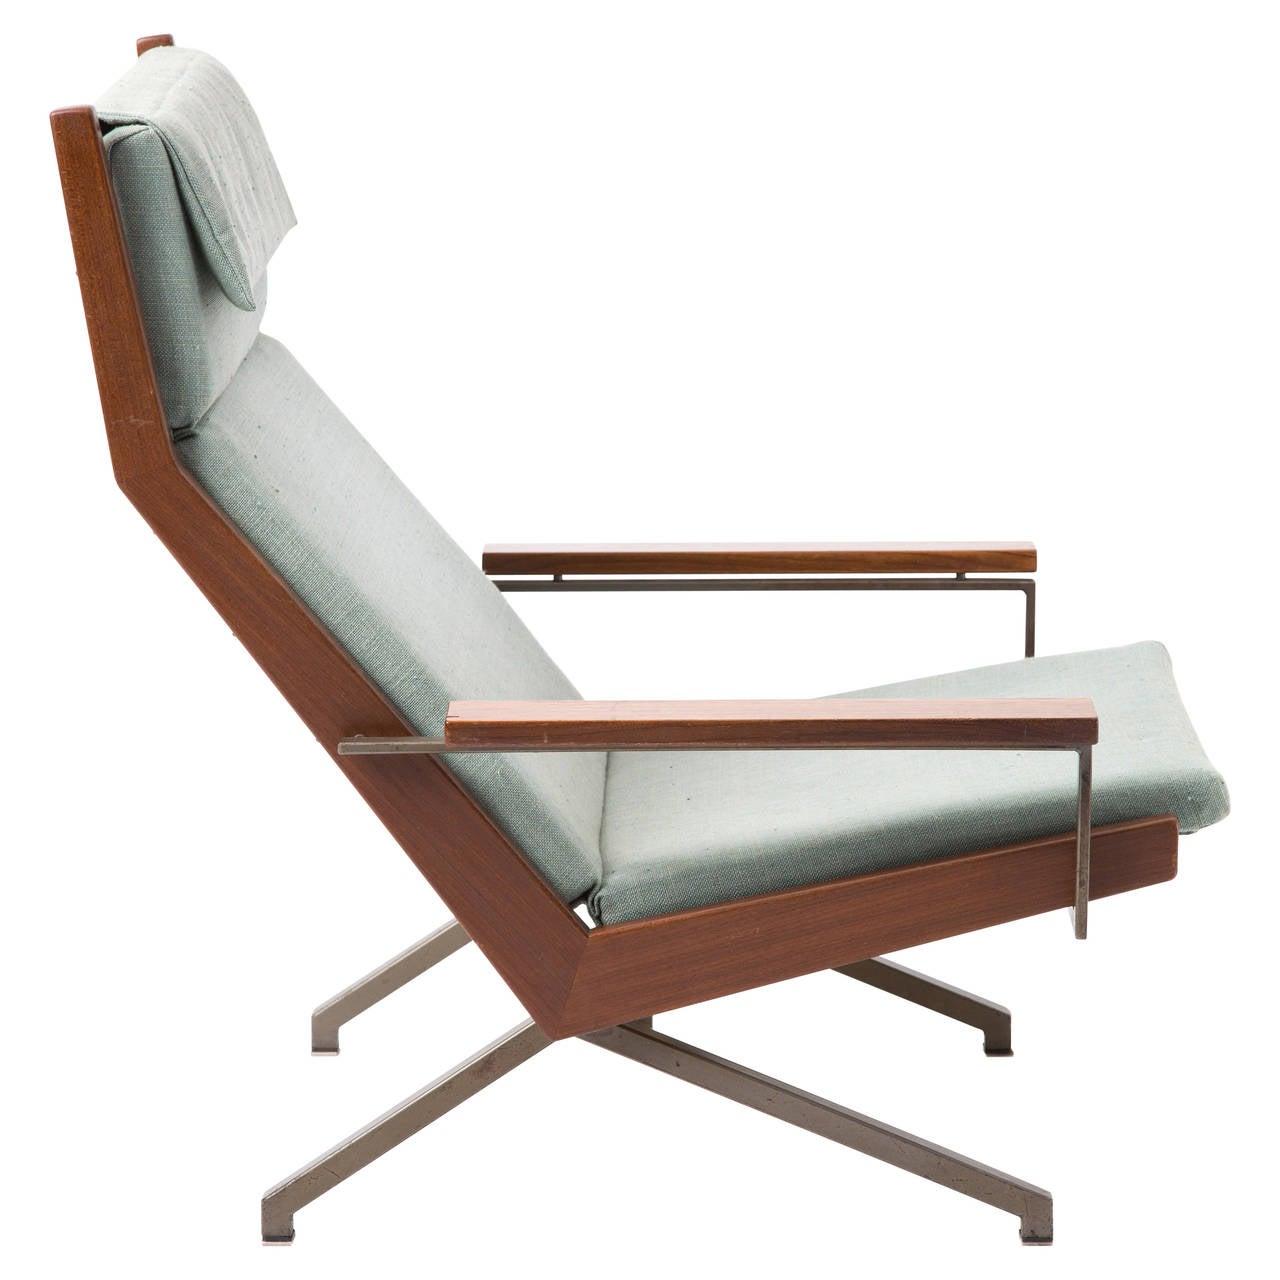 Rob Parry Dutch Design Gelderland Lounge Chair  Lotus  1. Rob Parry Dutch Design Gelderland Lounge Chair  Lotus  For Sale at